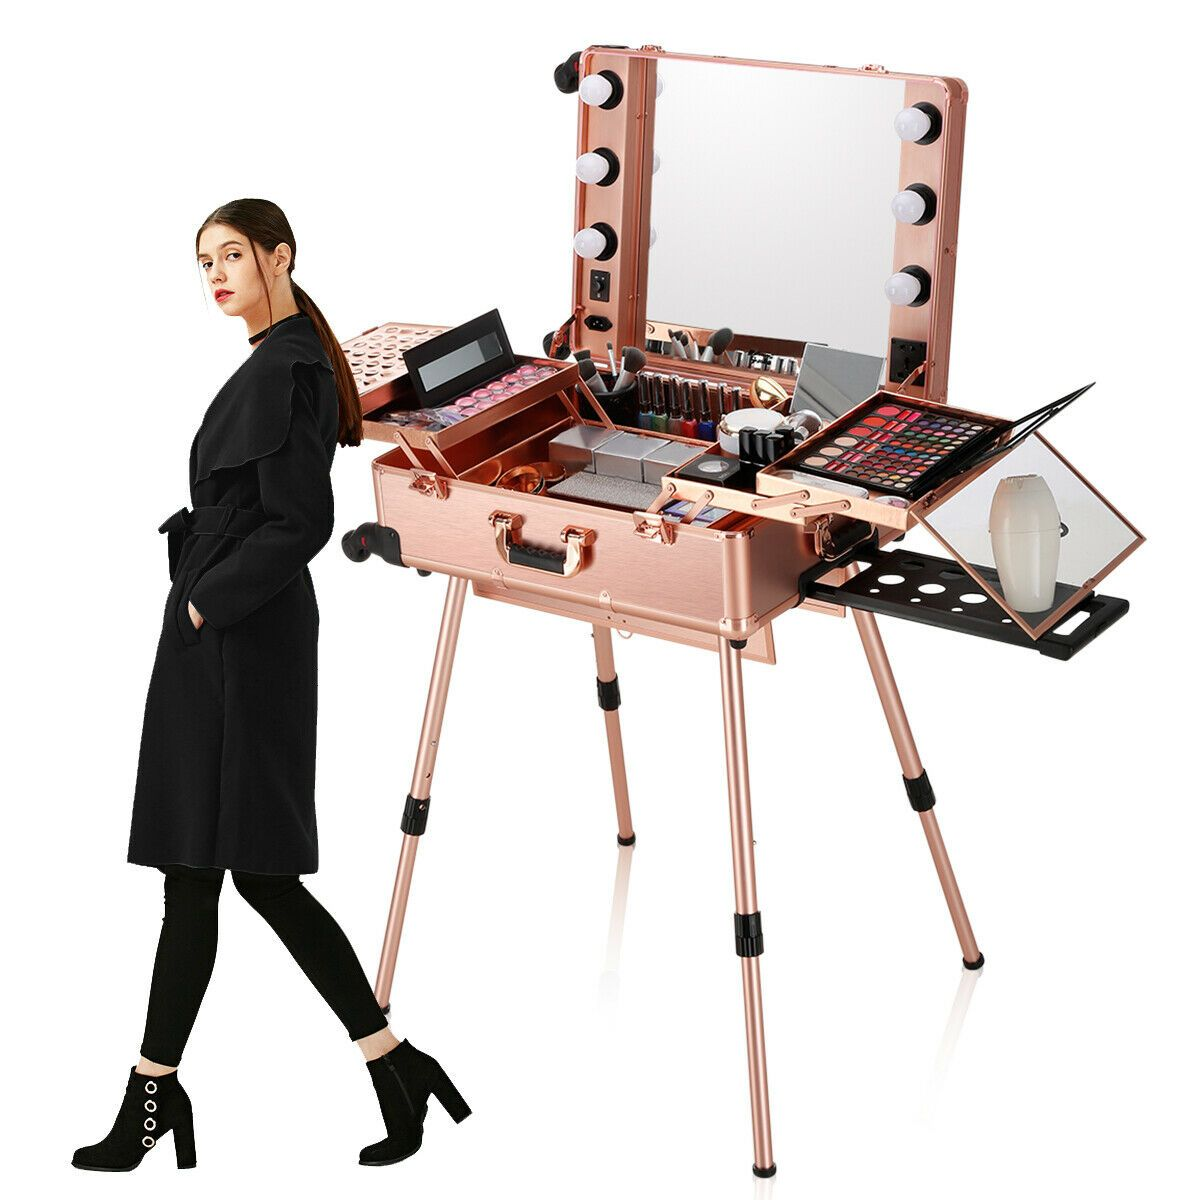 Pro Rolling Travel Makeup Train Case LED Light Standing